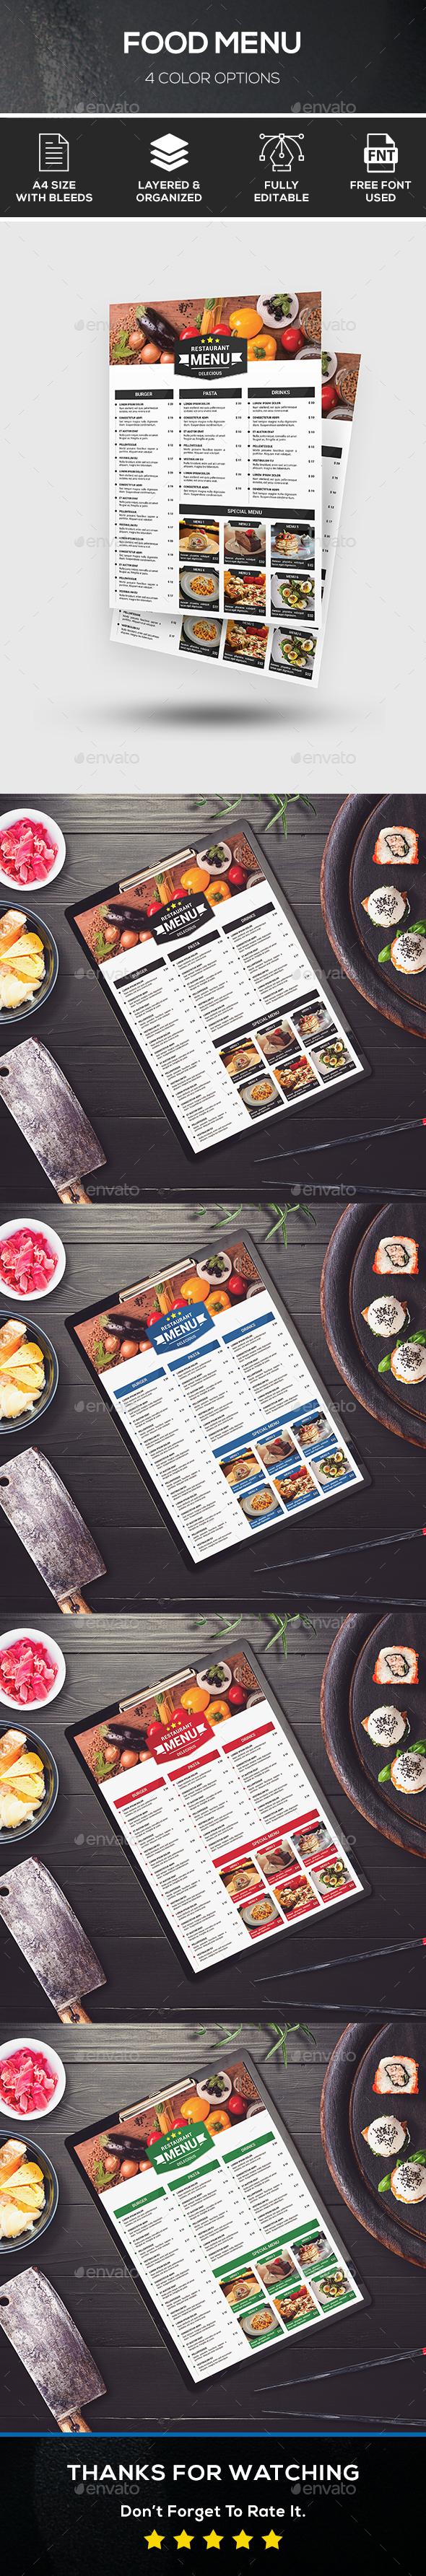 Food Menu - 4 Color Options - Food Menus Print Templates